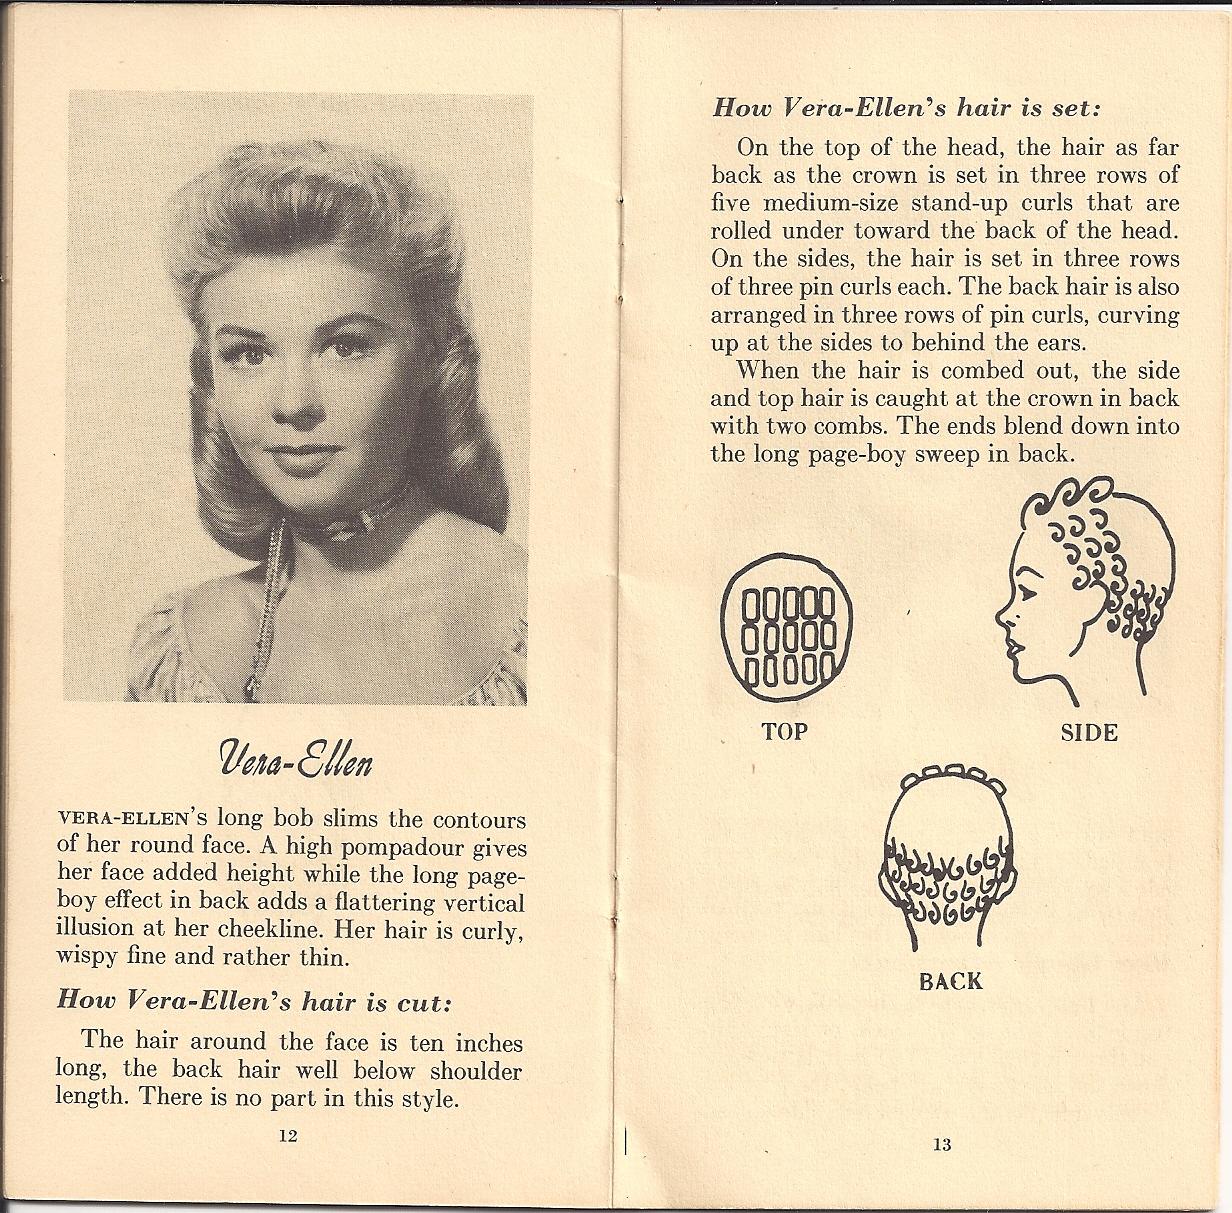 pin curl diagram 2004 ford freestar wiring repair guides sliding door system 10 hollywood hairstyles atomic panther